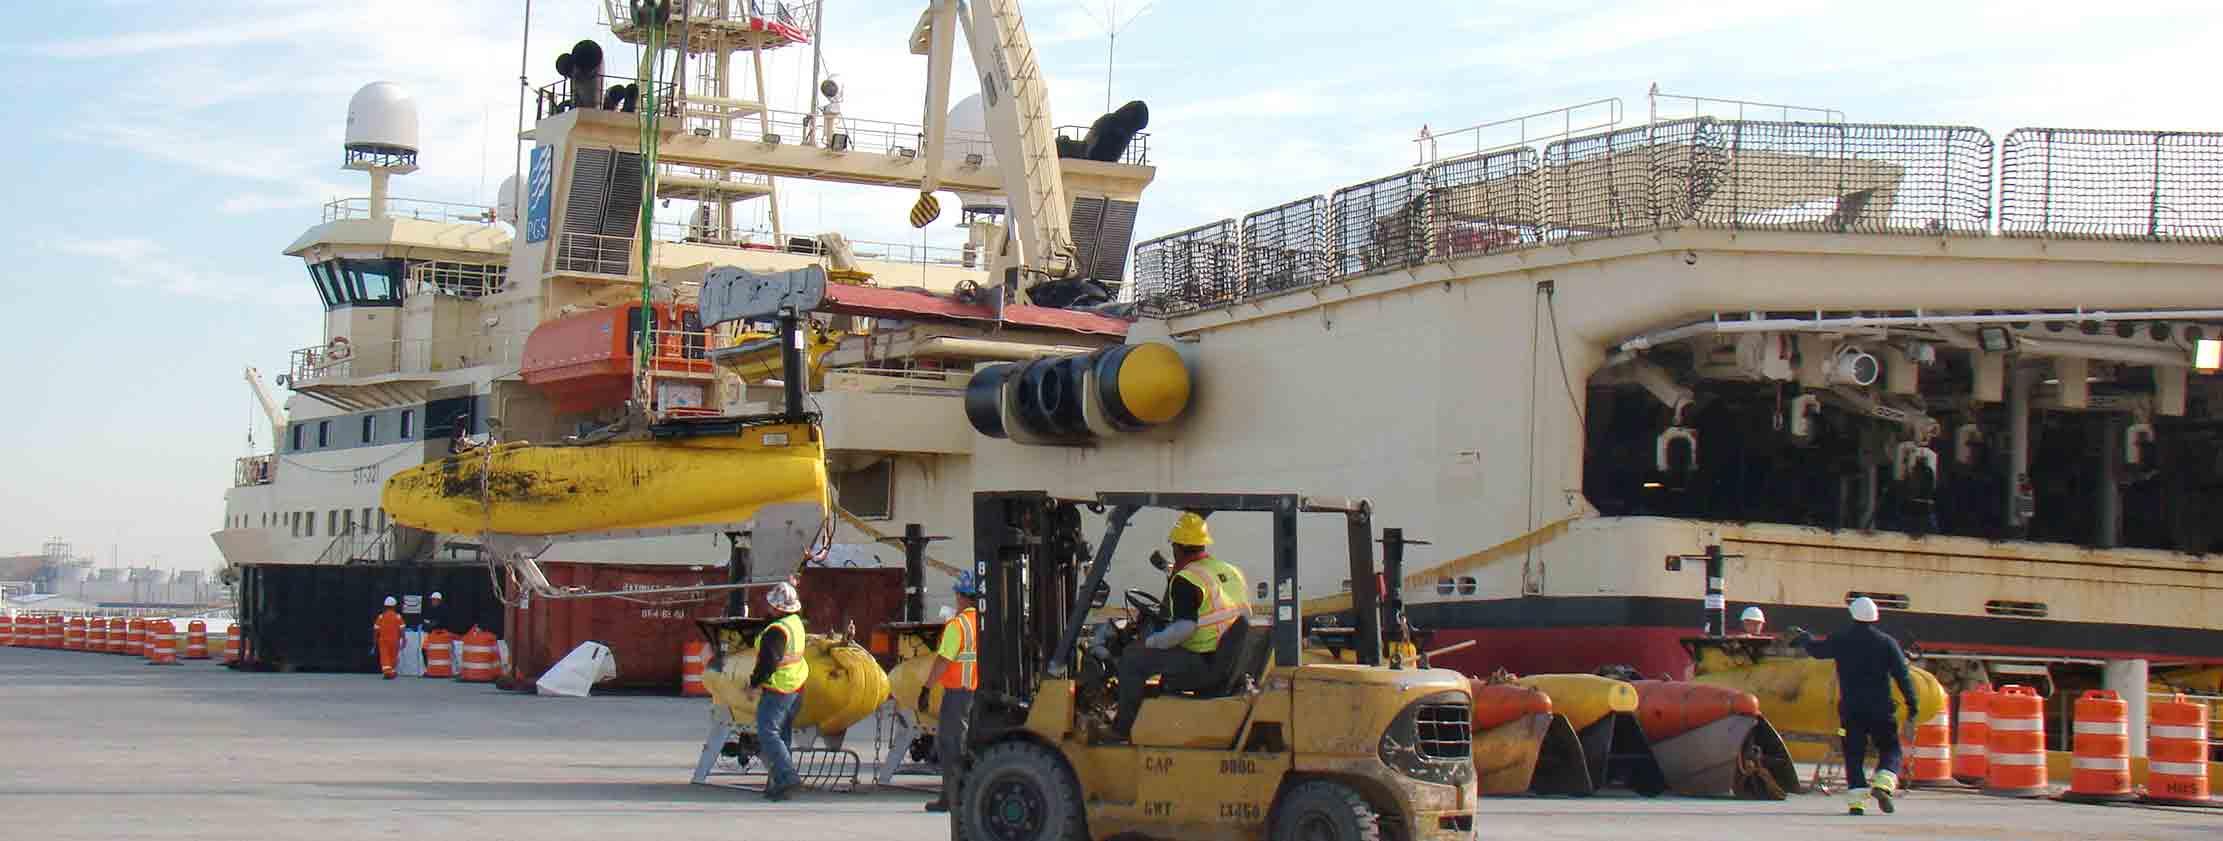 port freeport texas workforce